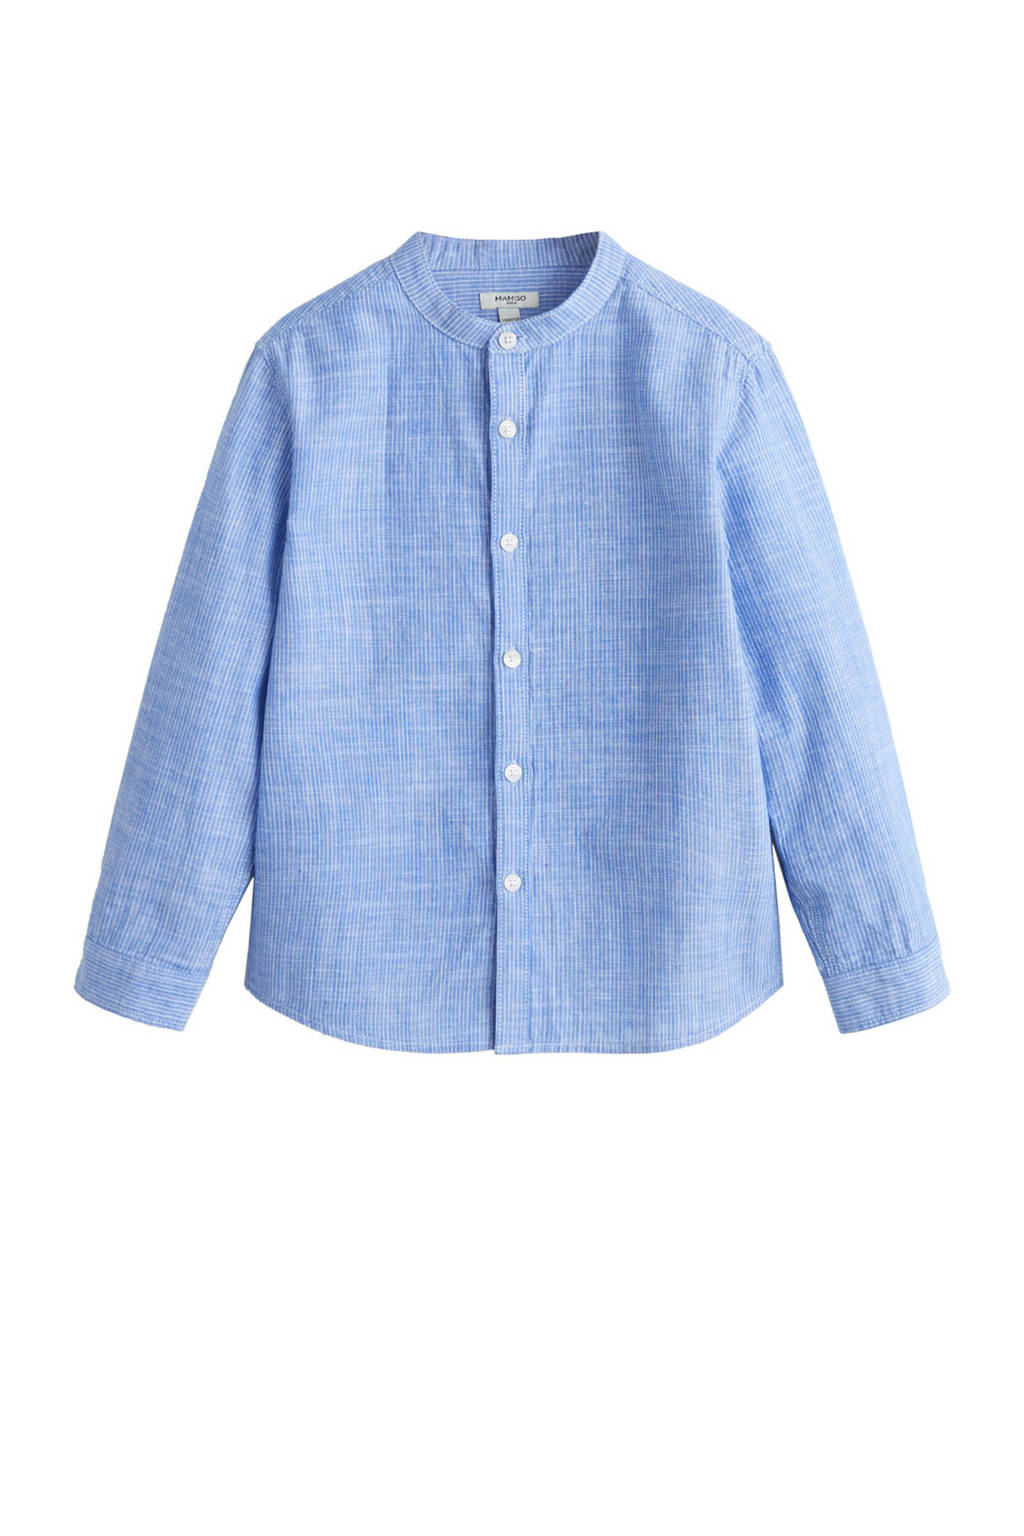 Overhemd Blauw.Mango Kids Gestreept Overhemd Blauw Wehkamp